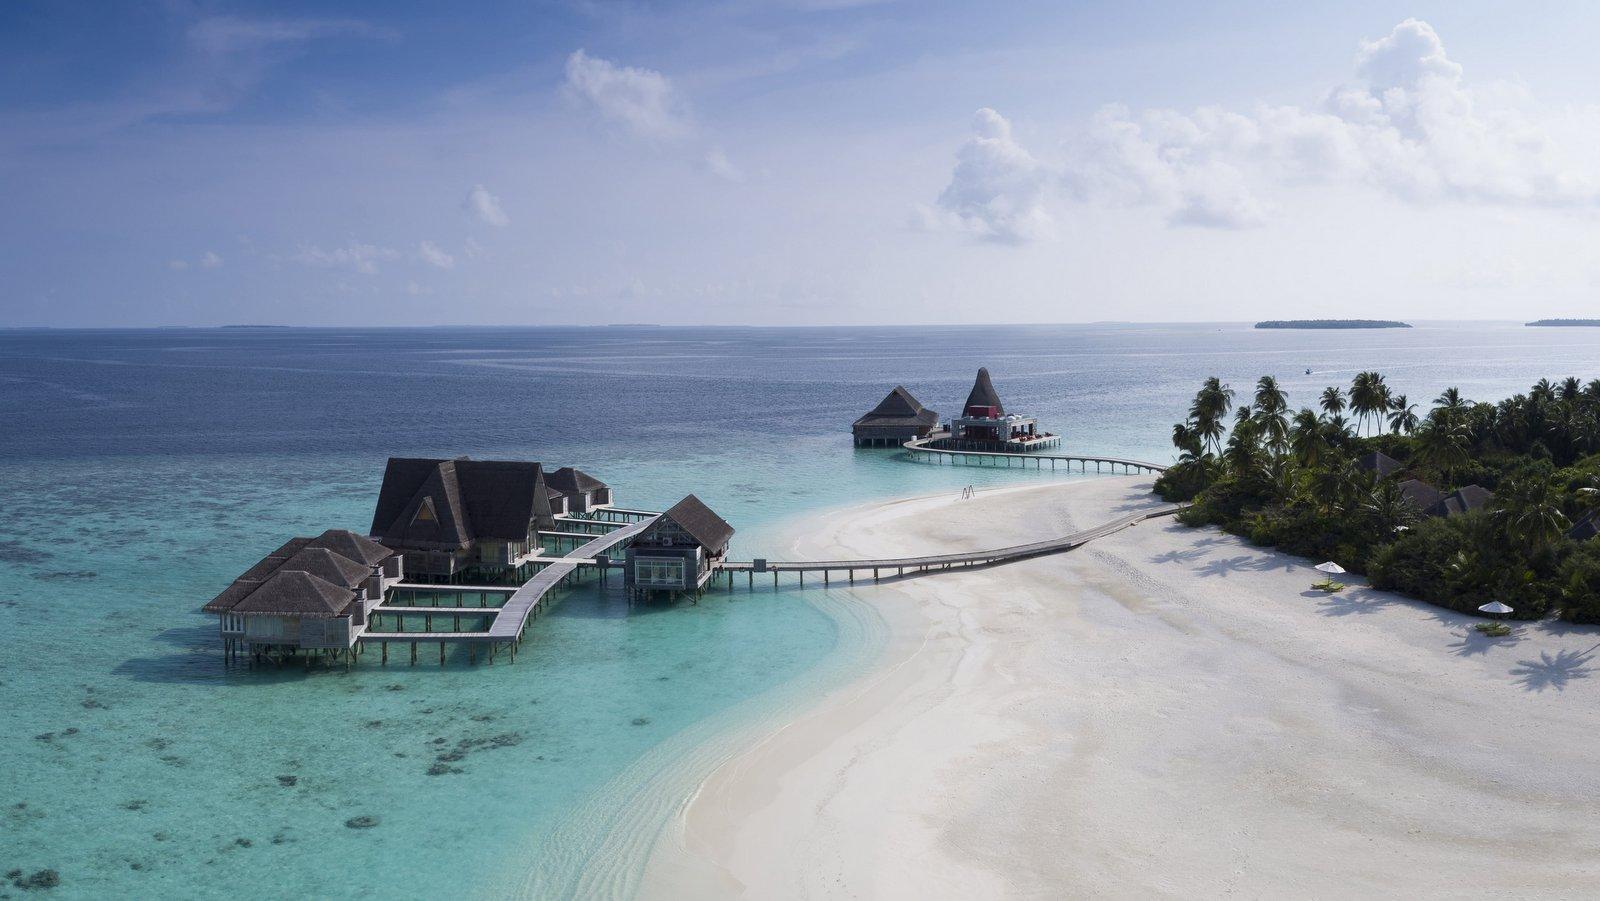 Мальдивы, отель Anantara Kihavah Maldives Villas, спа